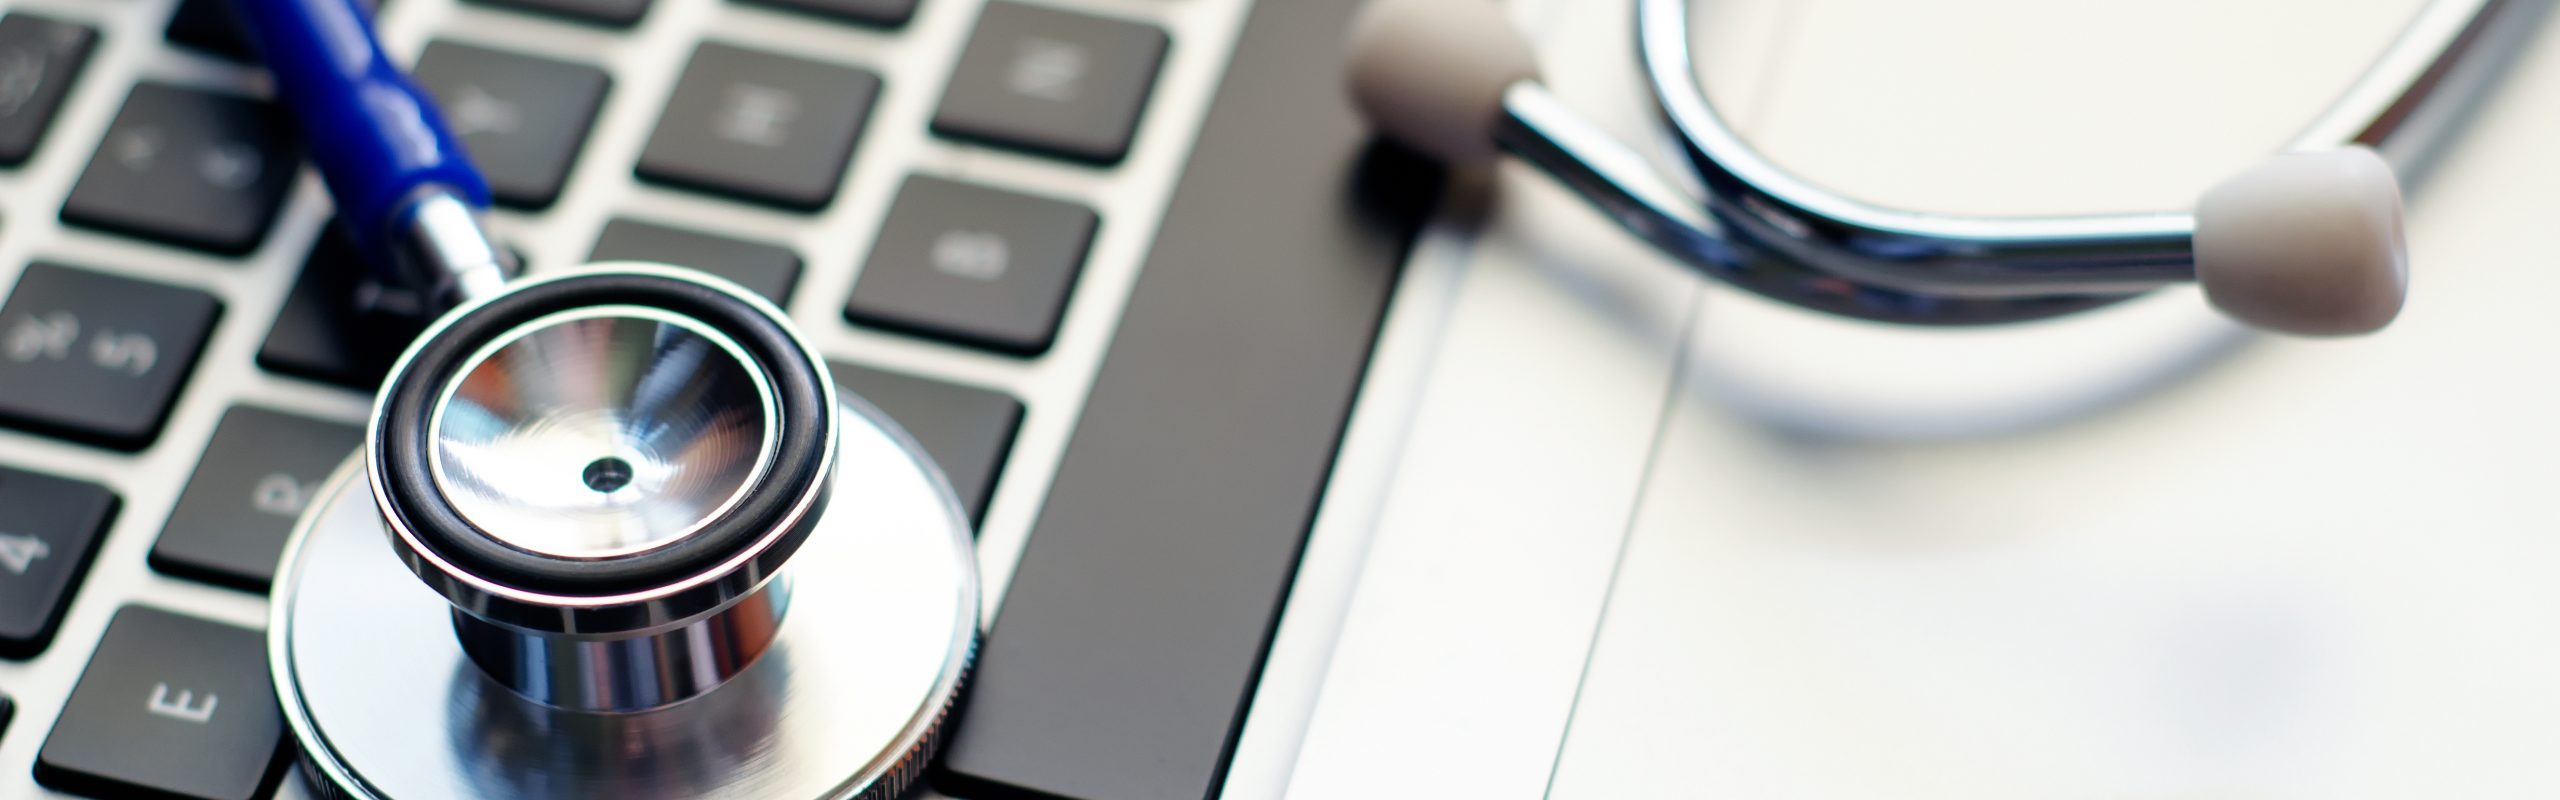 Stethoscope on Computer Laptop Keyboard